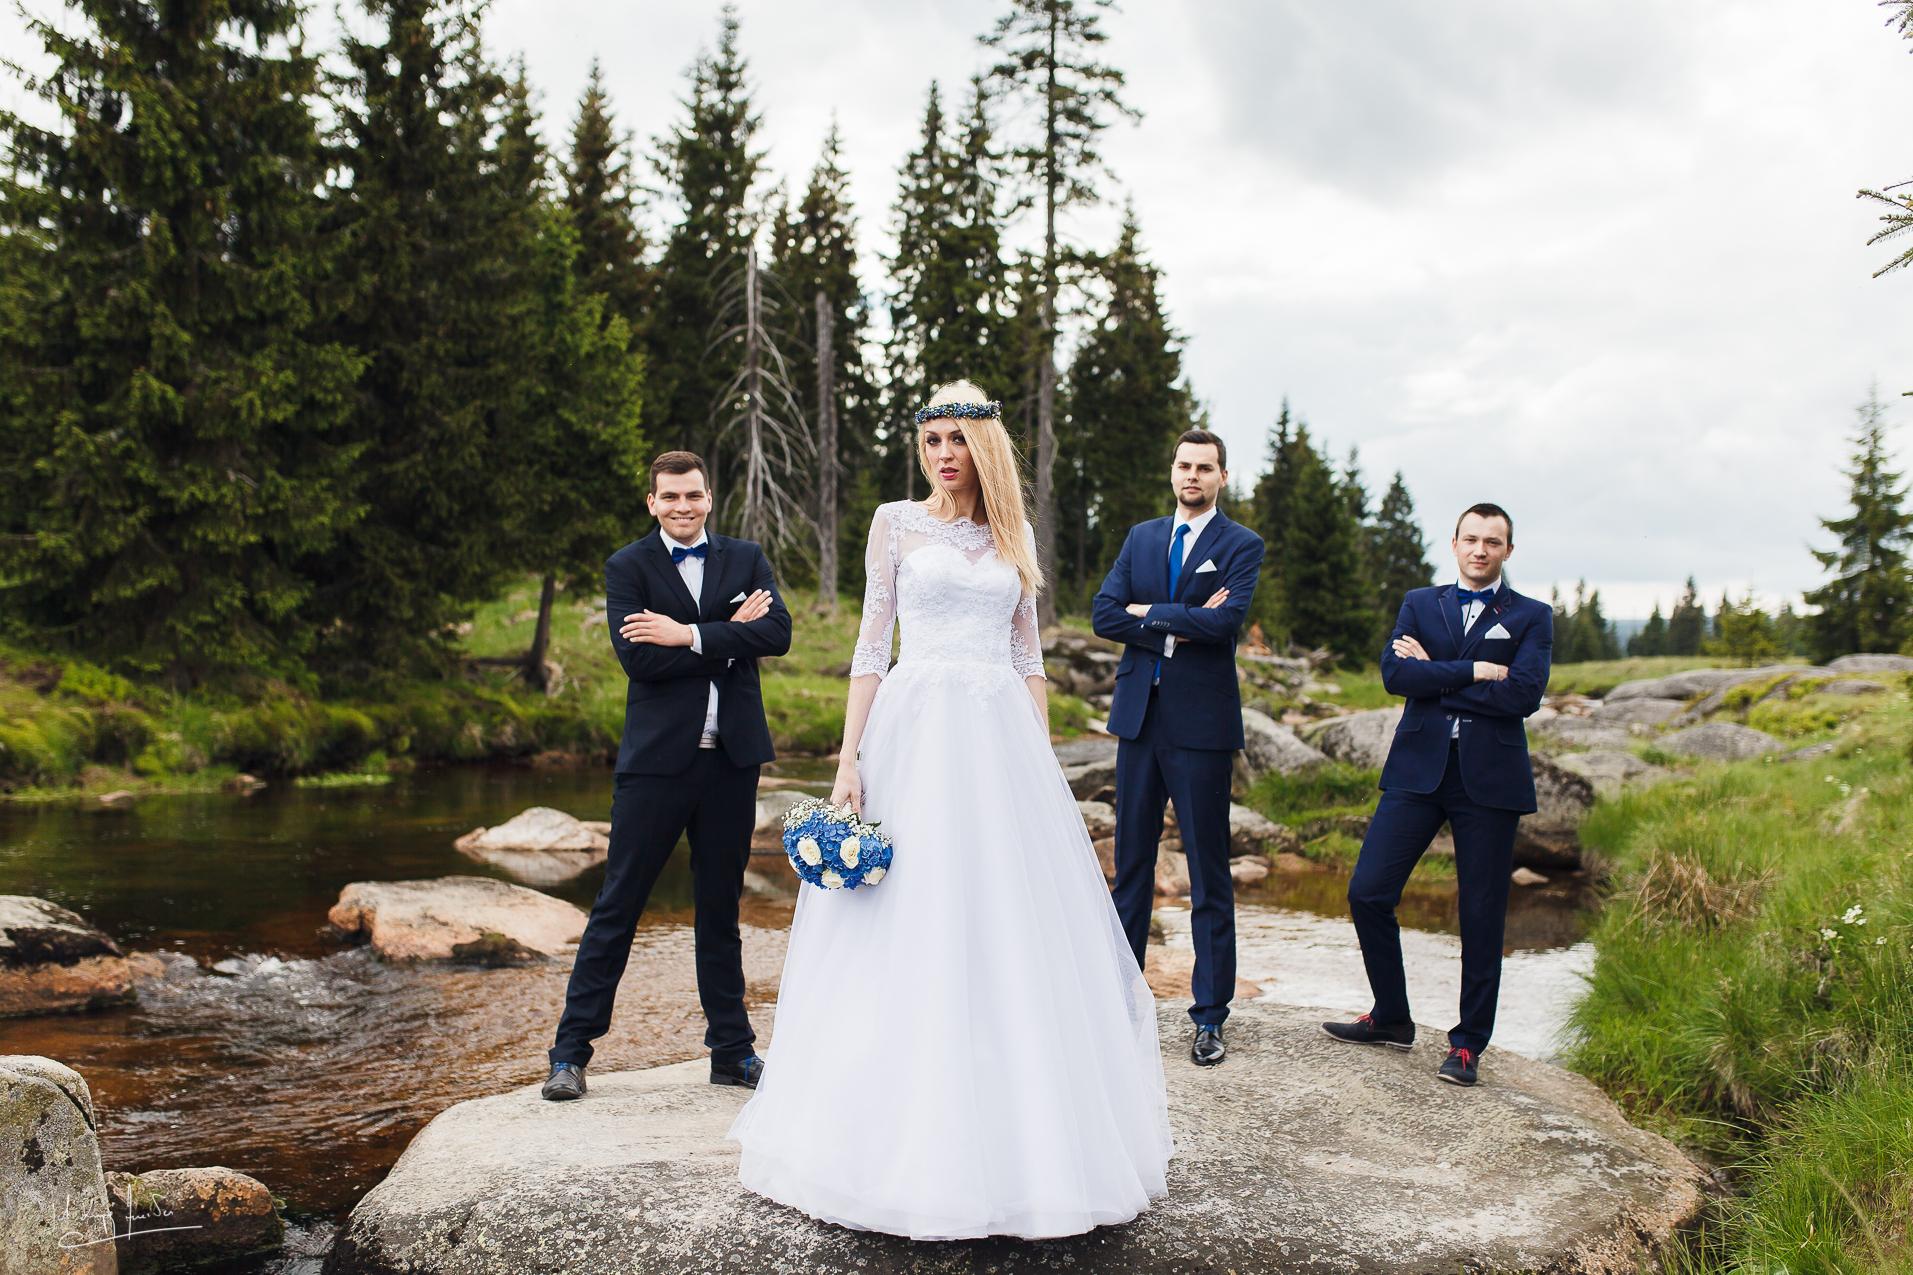 Ślub wesele szklarska poręba 46 Marta & Sławek